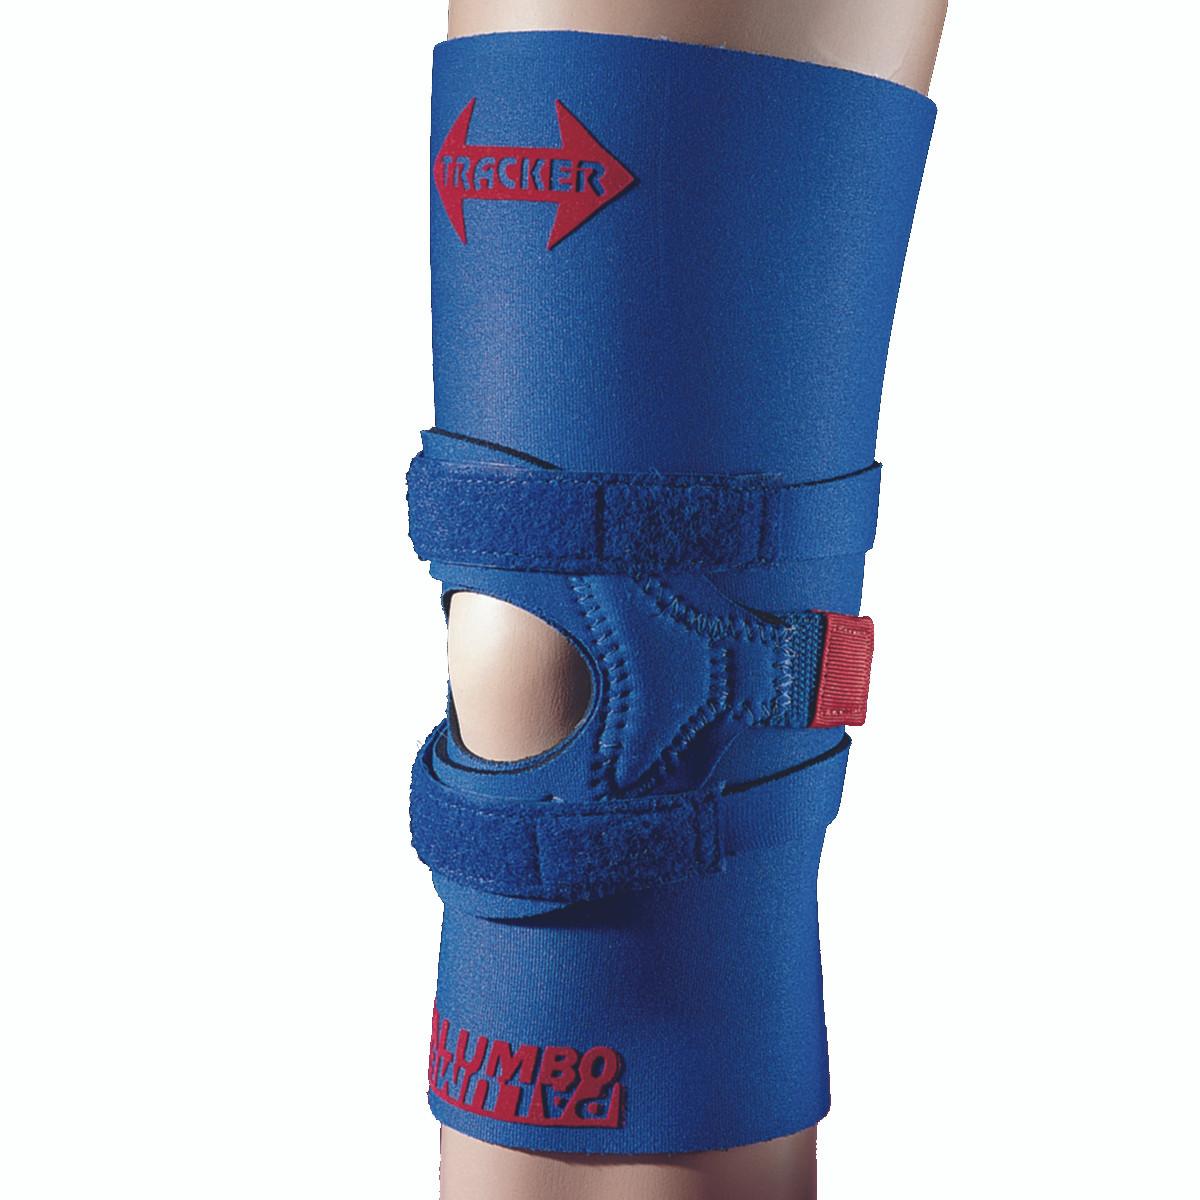 cfa2e9792b Palumbo Knee Brace Stabilizing Brace - Freeman Mfg Co.